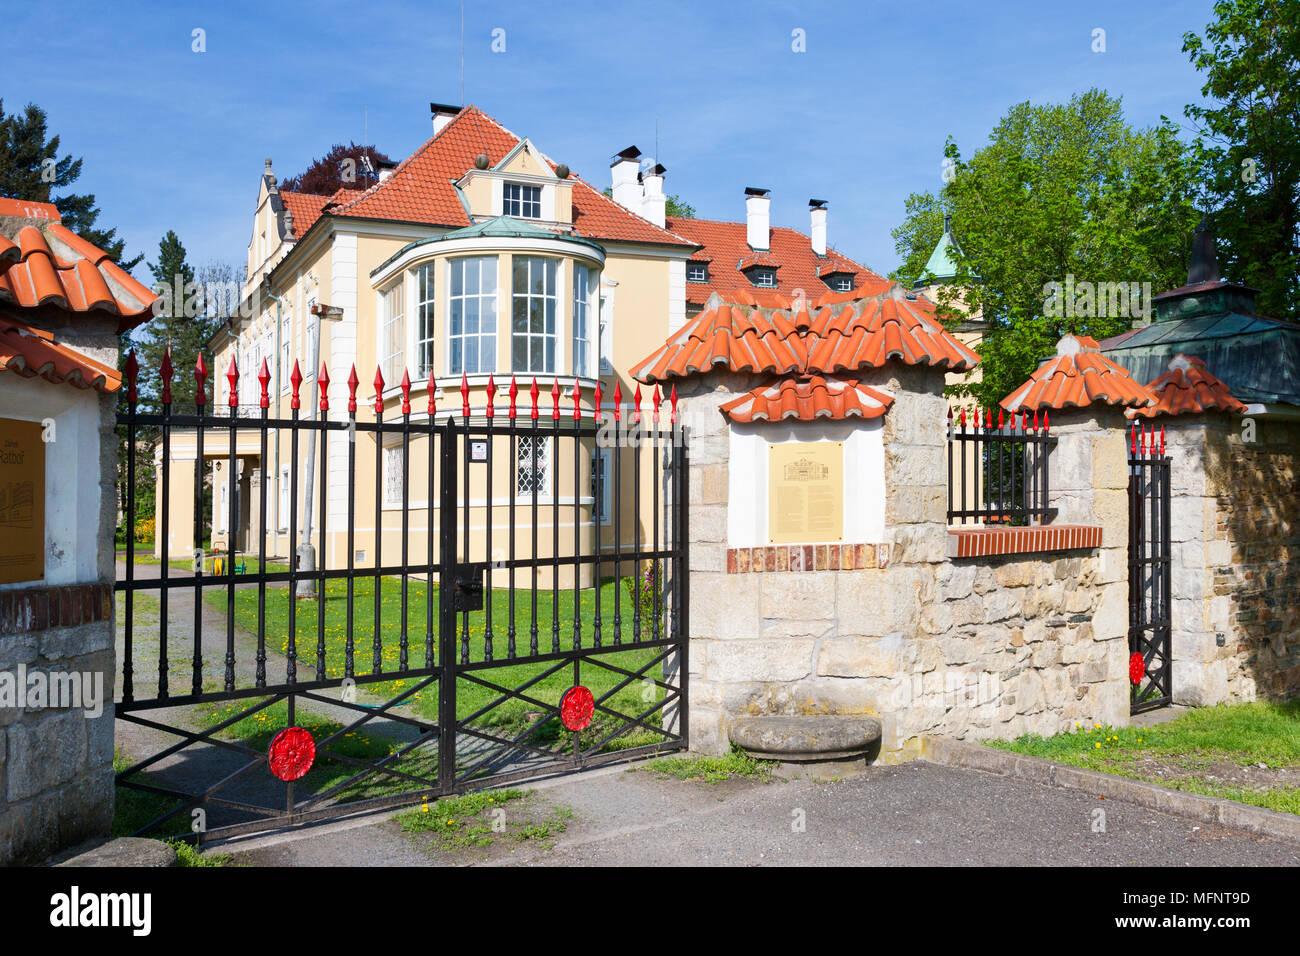 Starý zámek (1911, arch. Jan Kotěra), Ratboř u Kolína, Stredocesky kraj, Ceska republika / Old Chateau, Ratbor near Kolin town, Central Bohemian regio Stock Photo